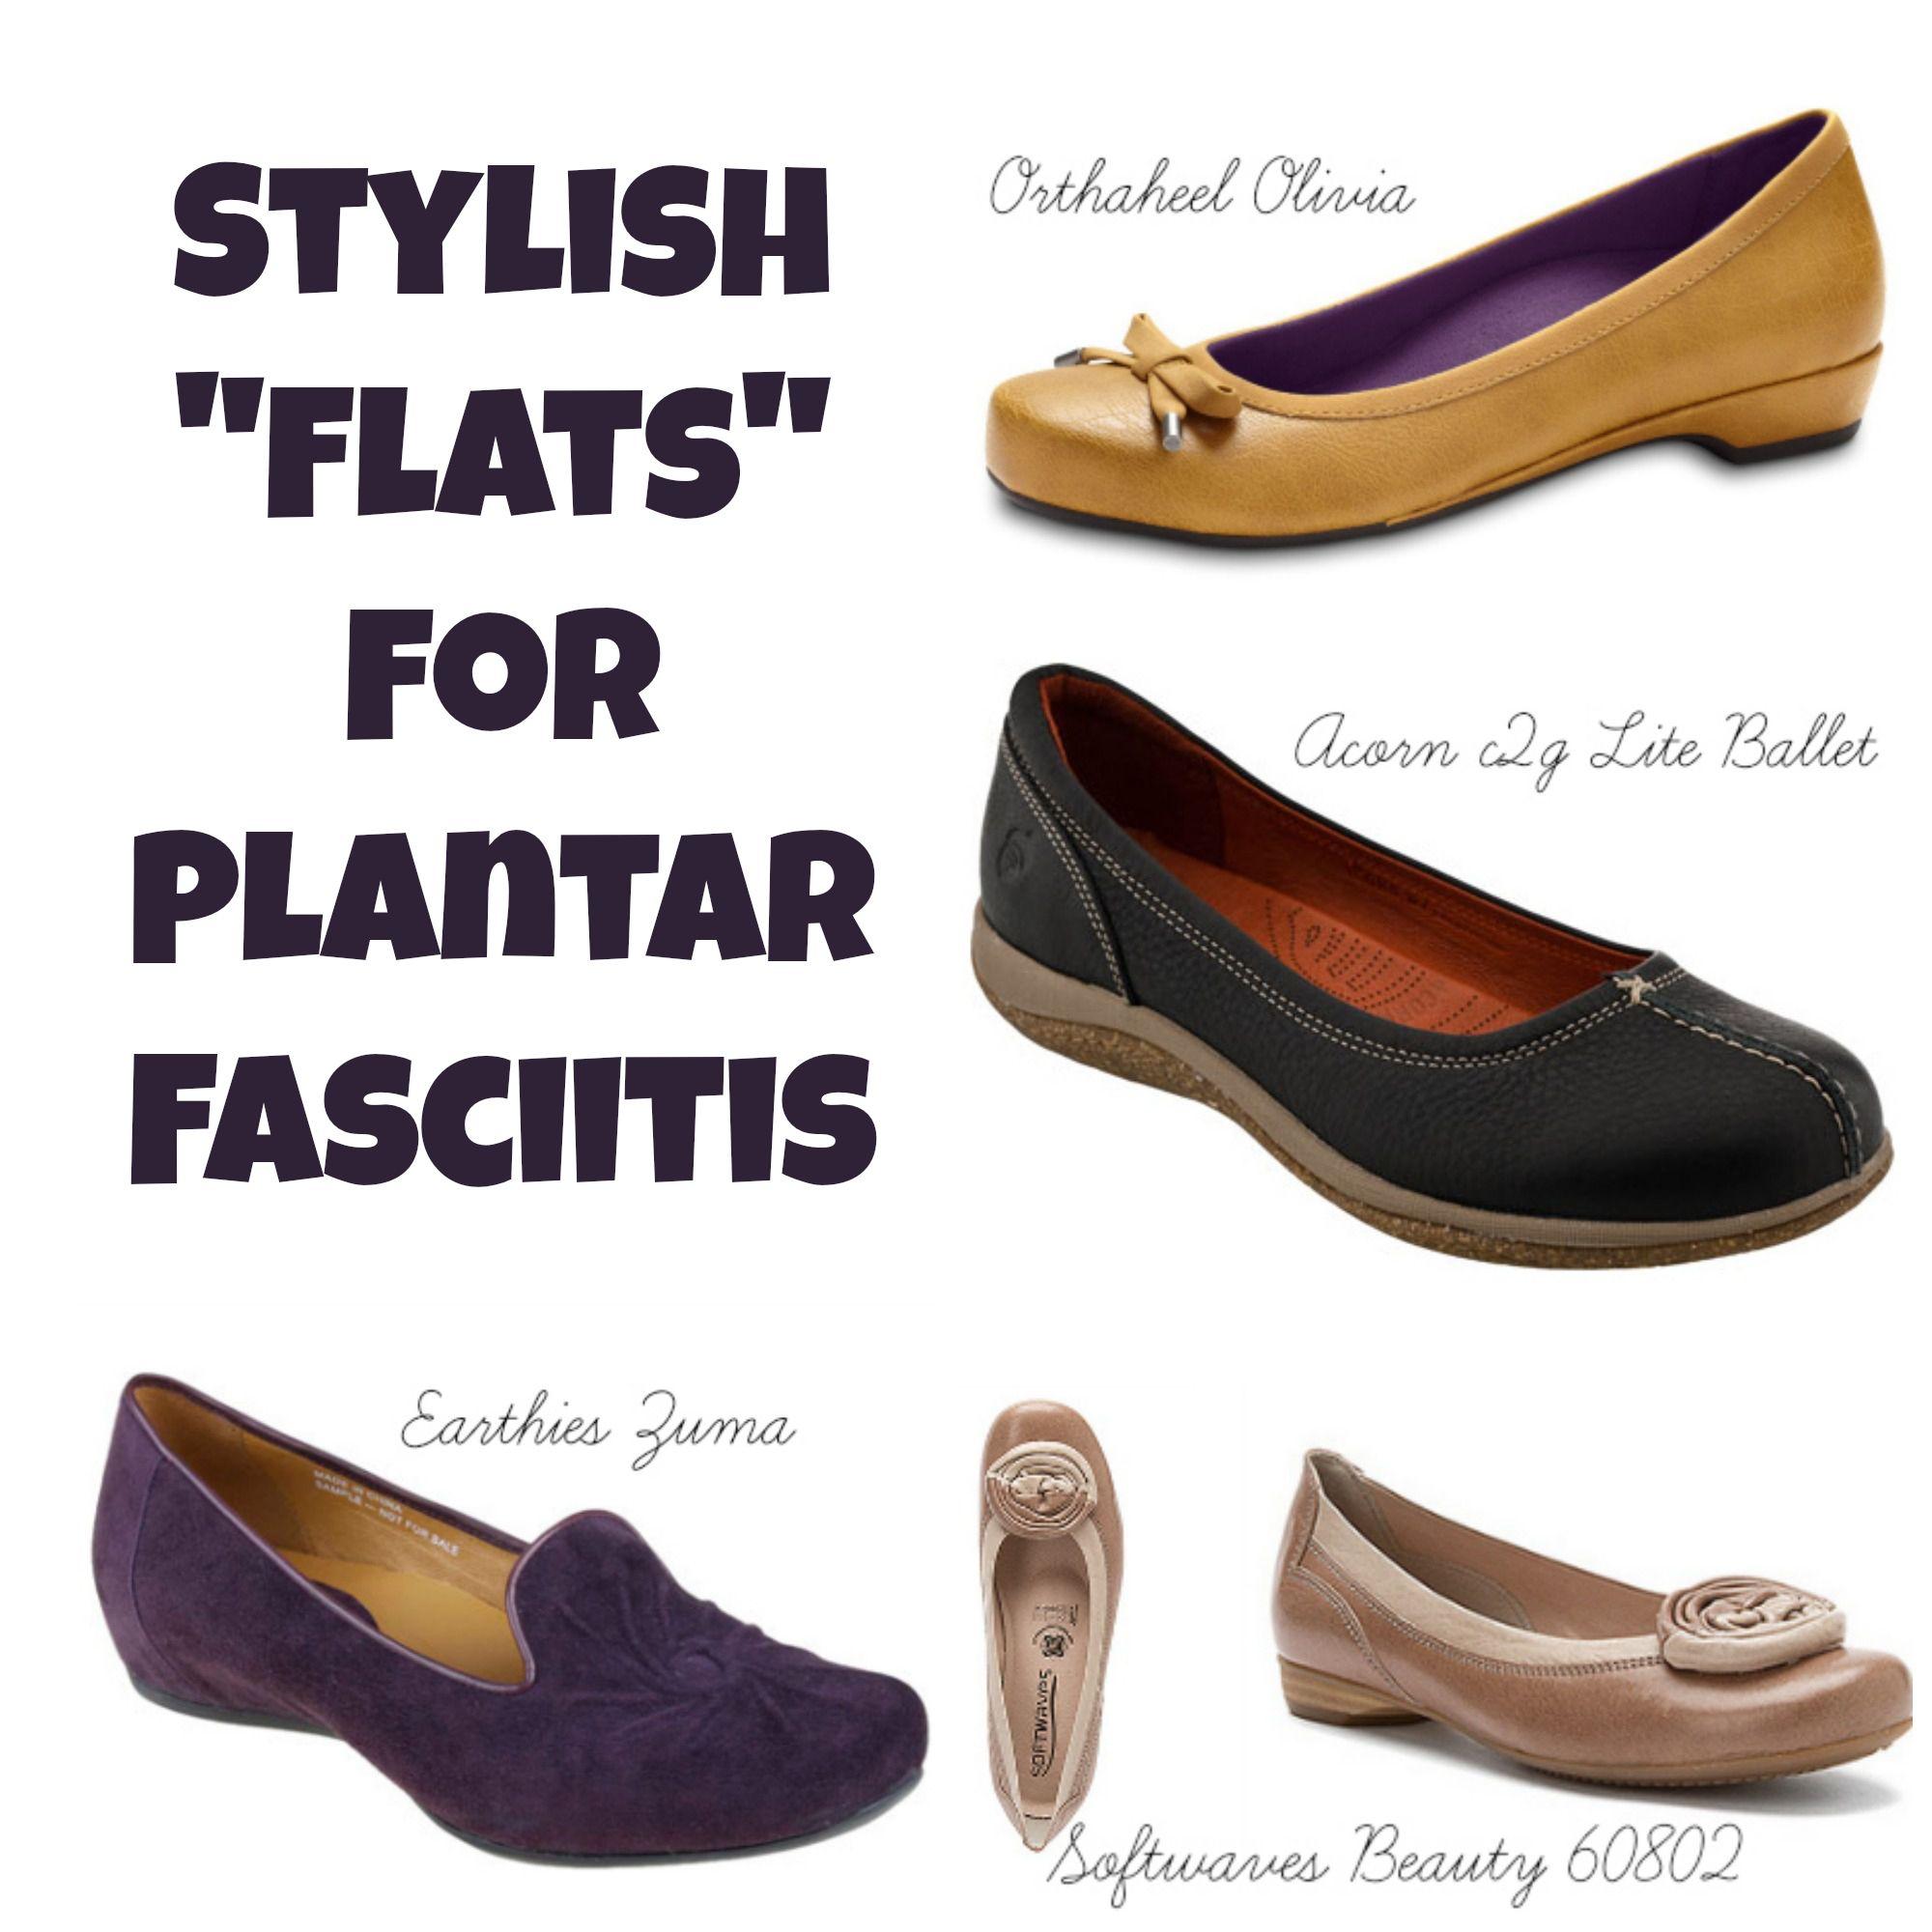 5 stylish flats for plantar fasciitis